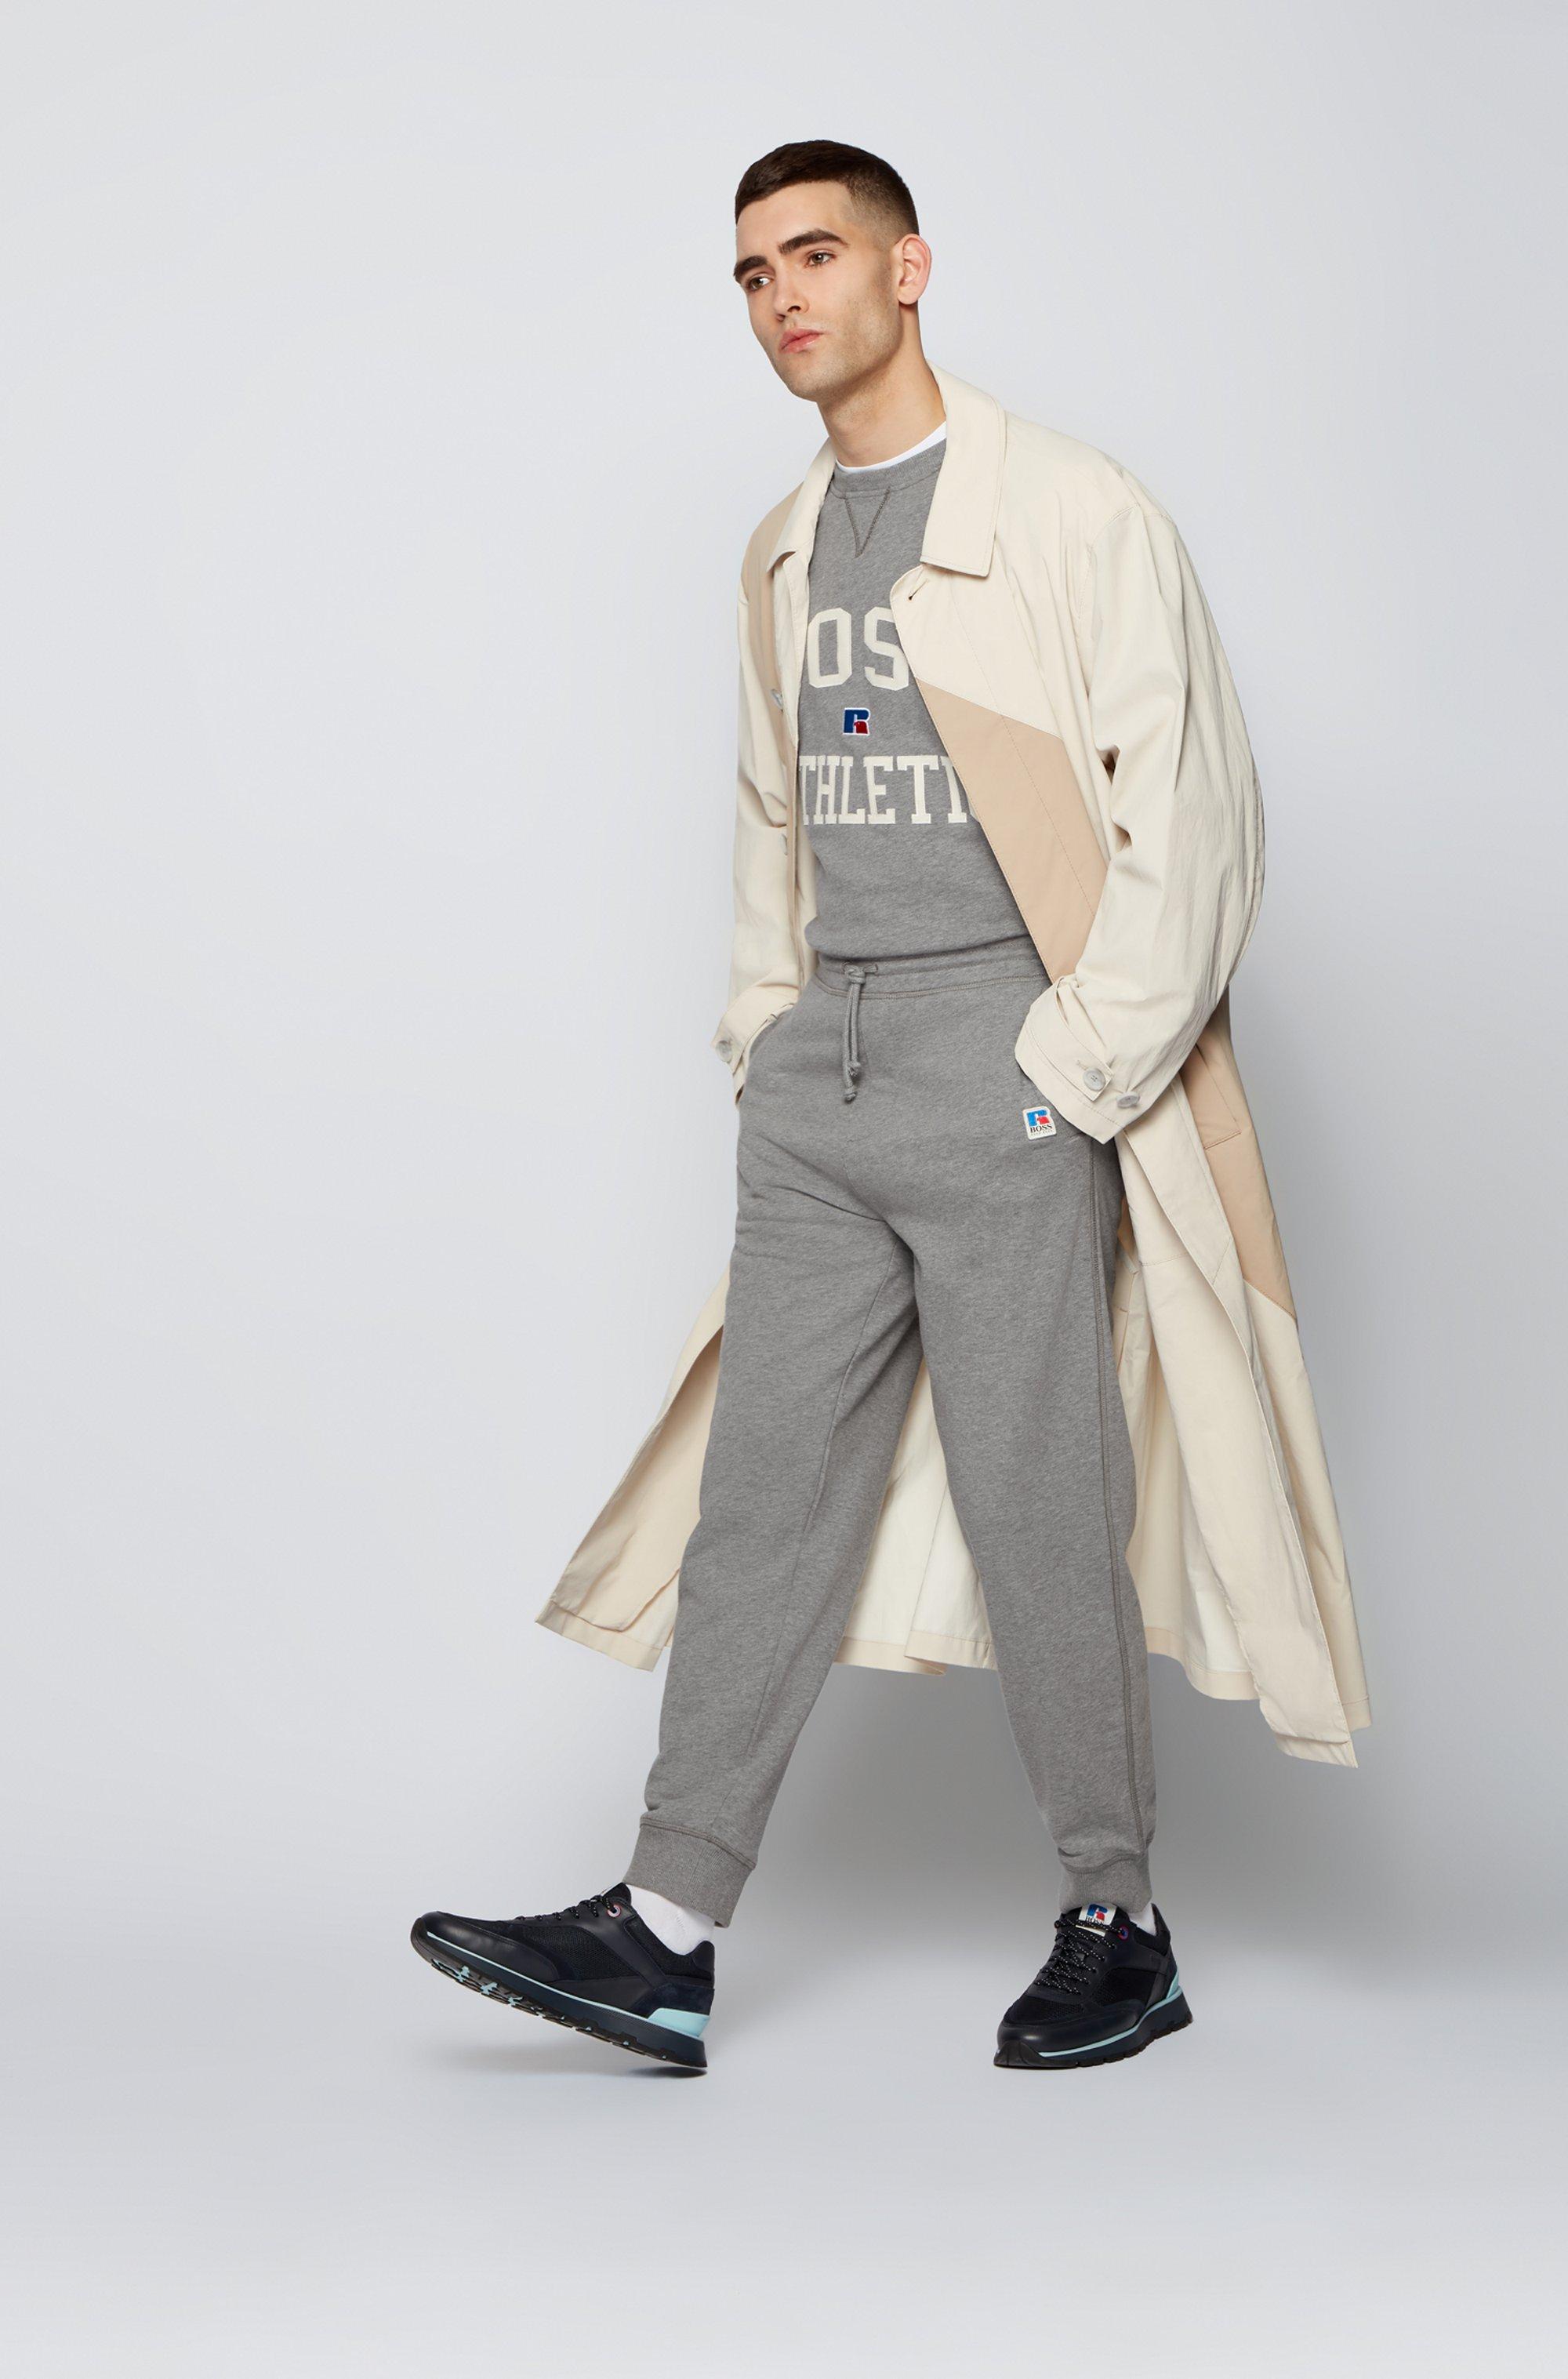 Sudadera unisex relaxed fit en algodón orgánico con logo exclusivo